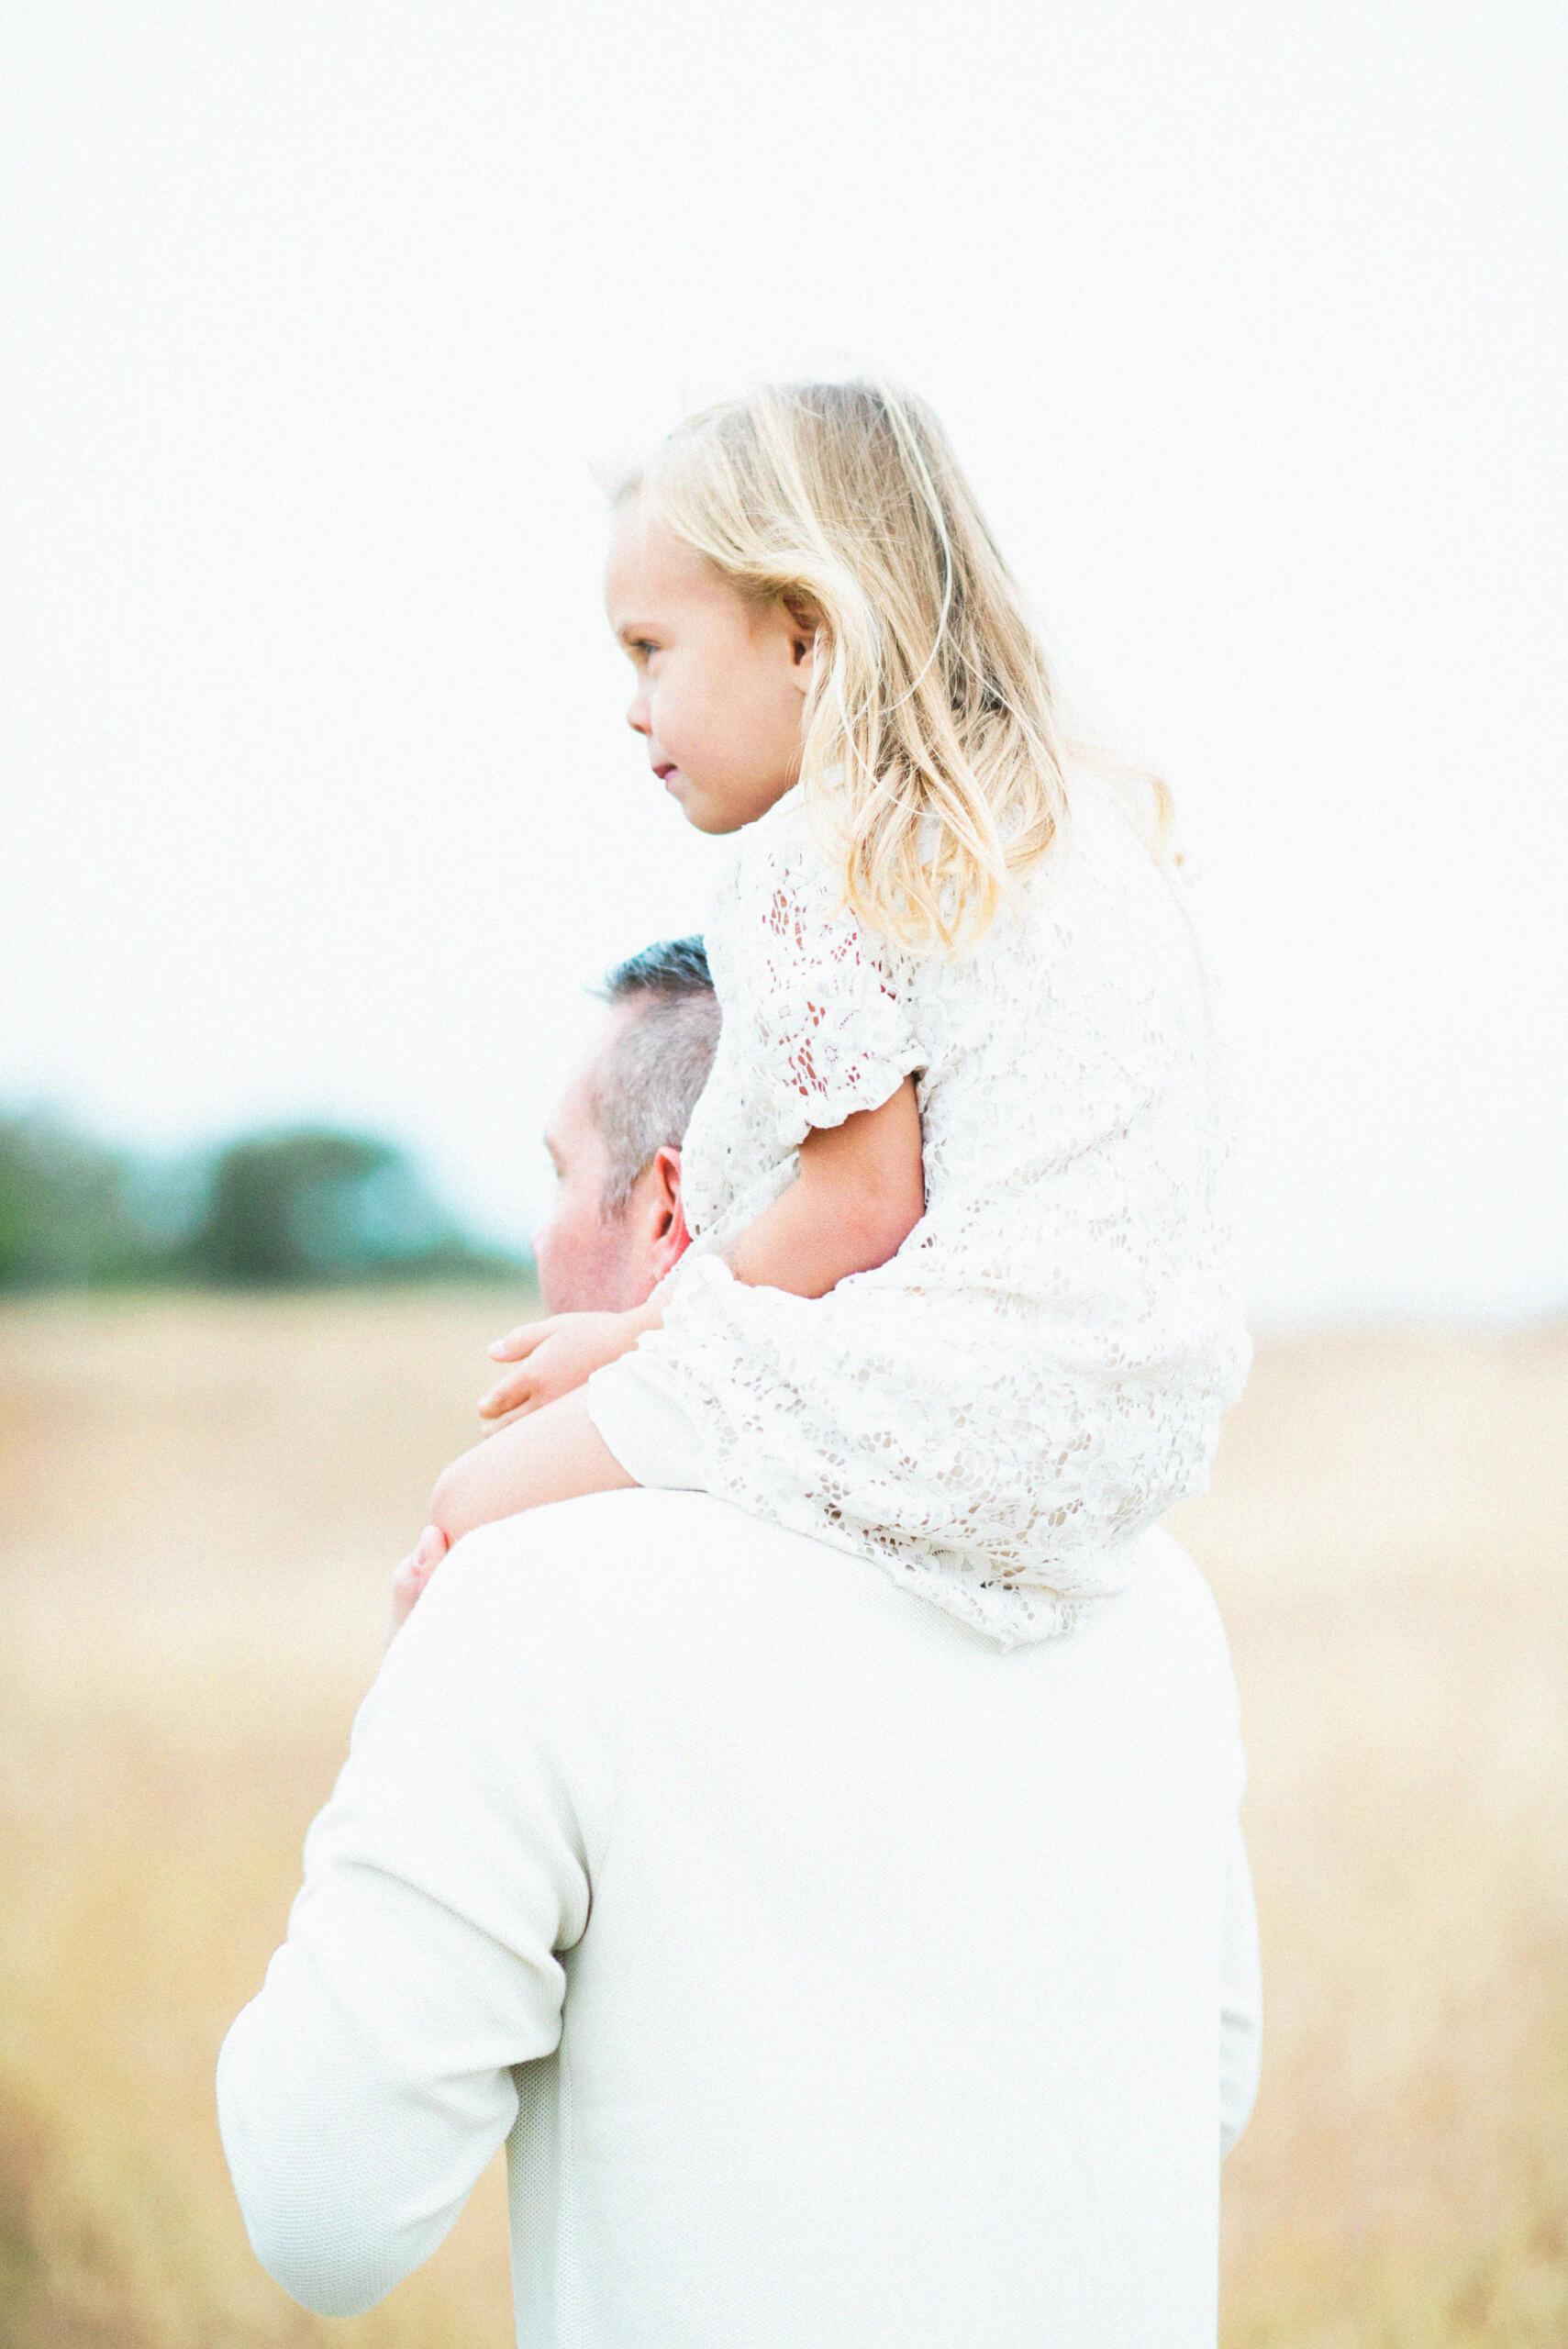 Encinitas Newborn Photographer